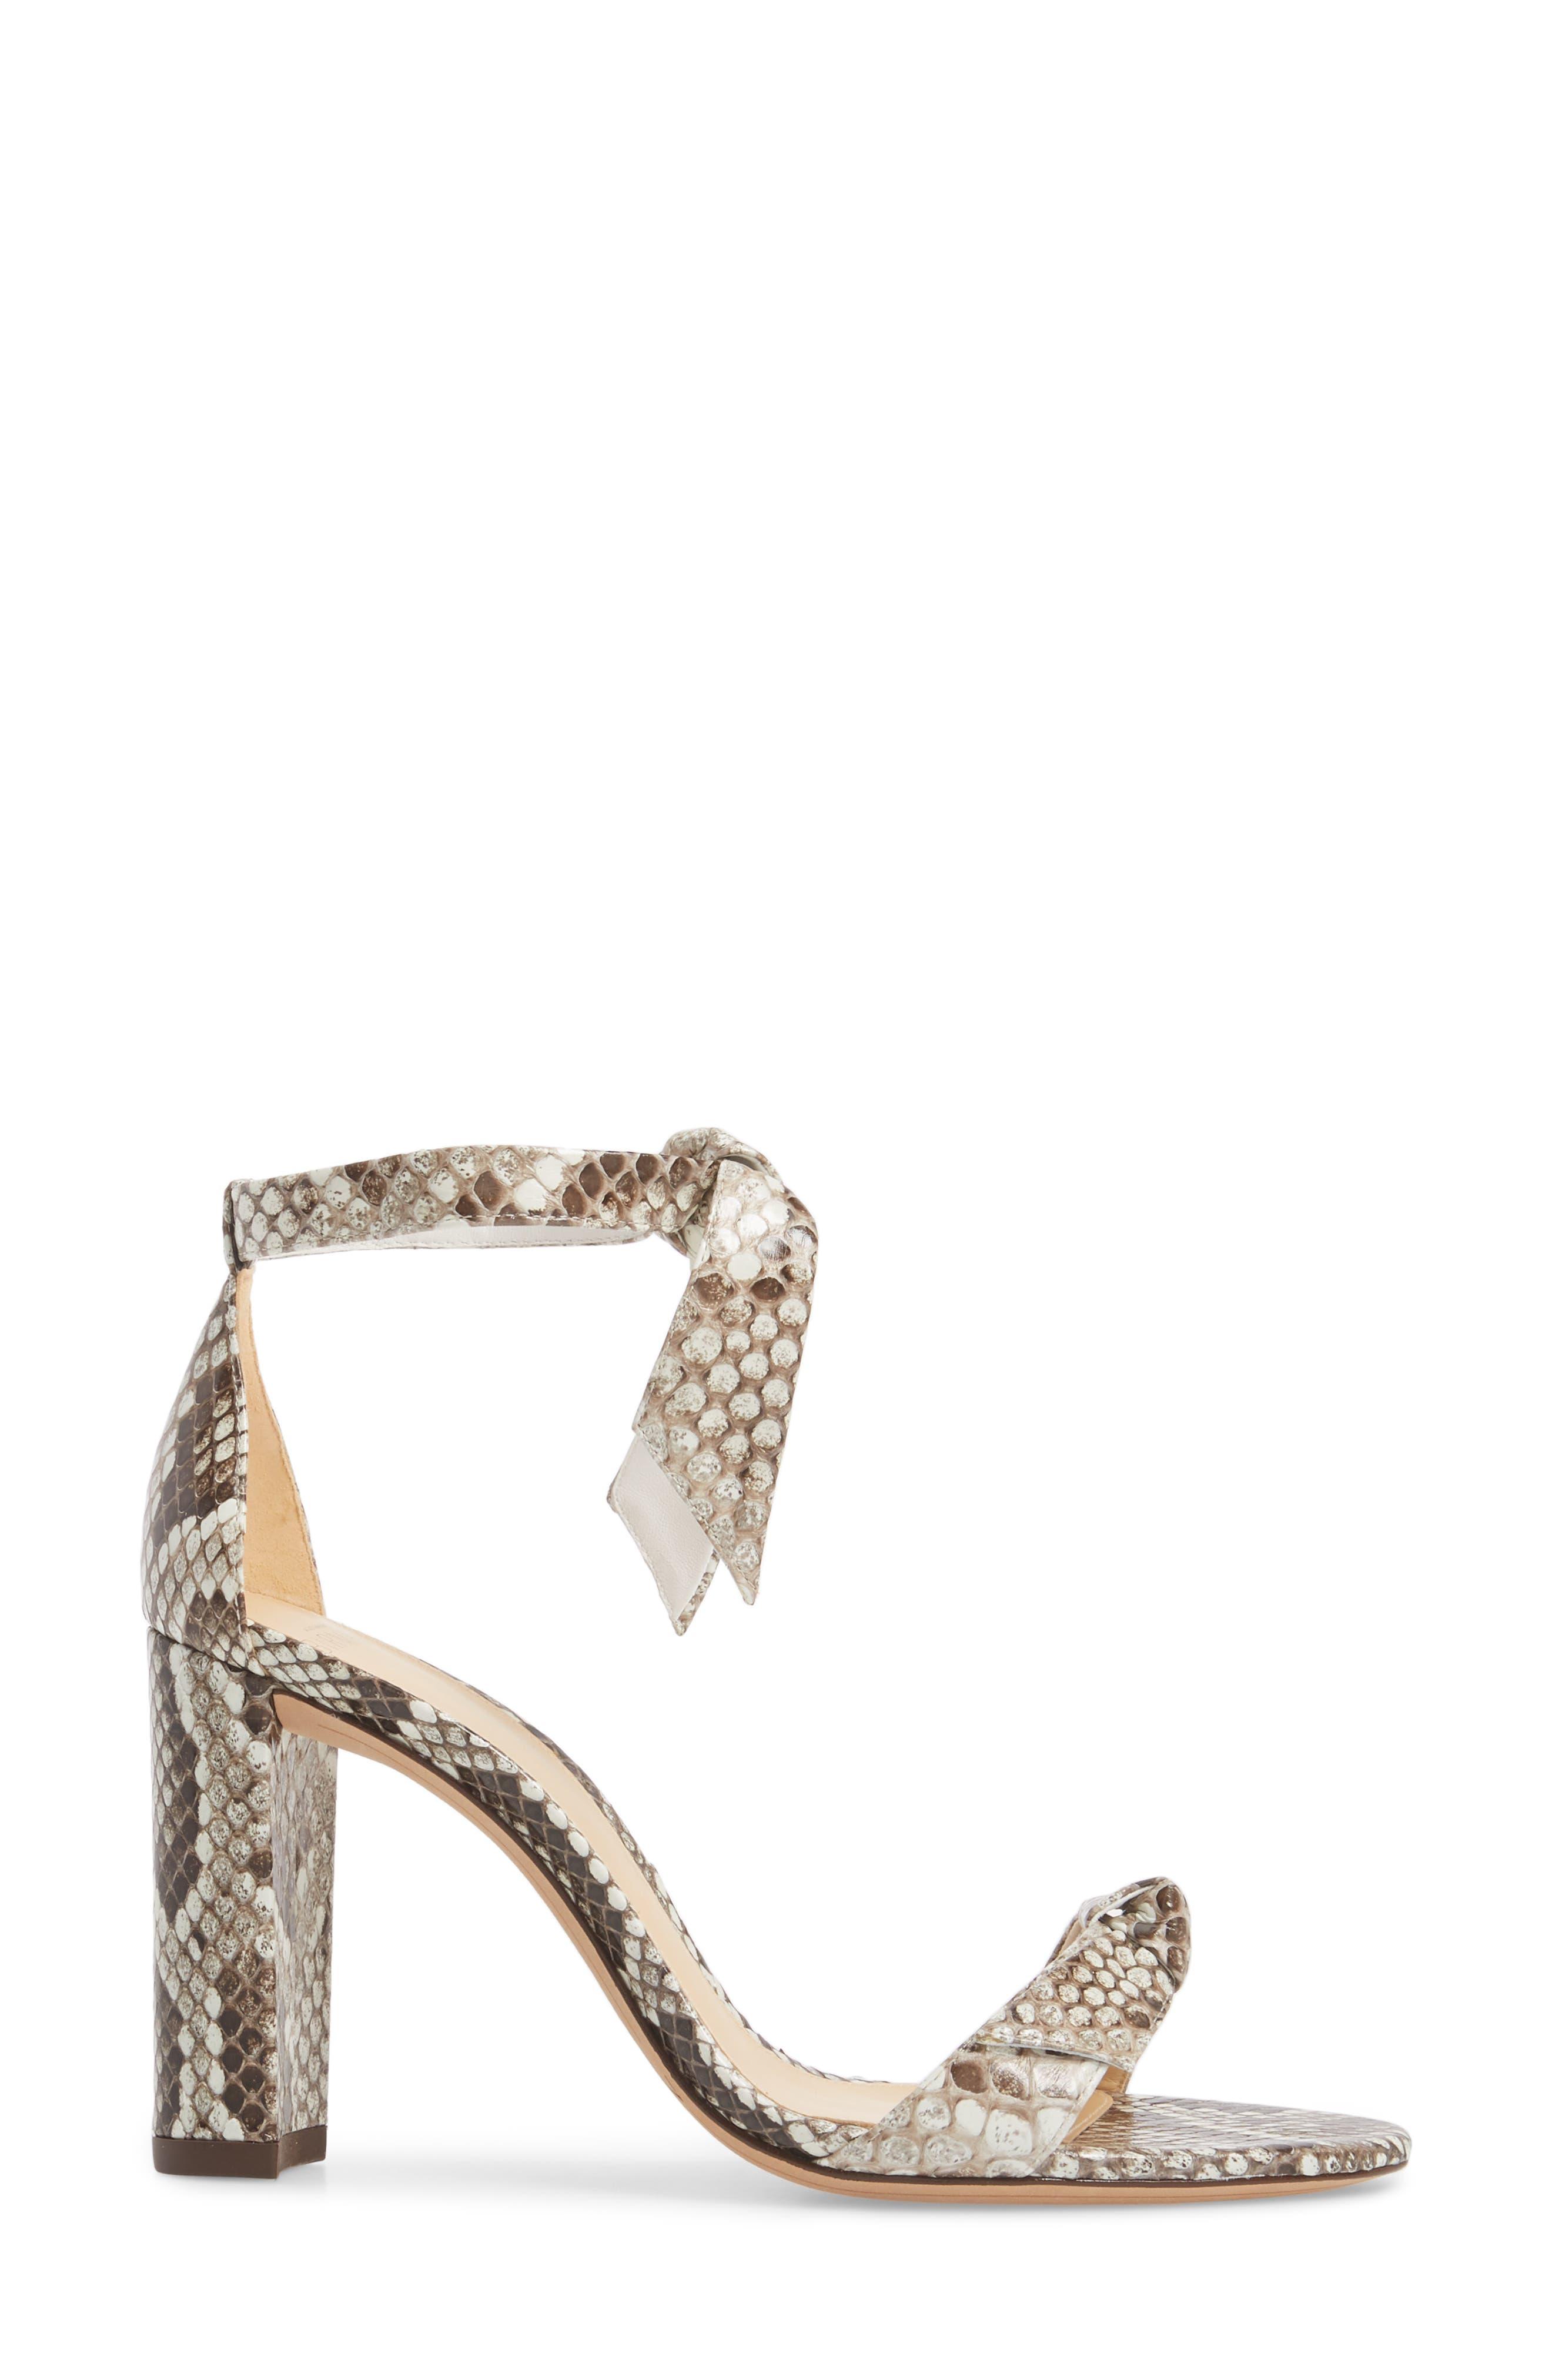 Clarita Genuine Python Ankle Tie Sandal,                             Alternate thumbnail 3, color,                             250